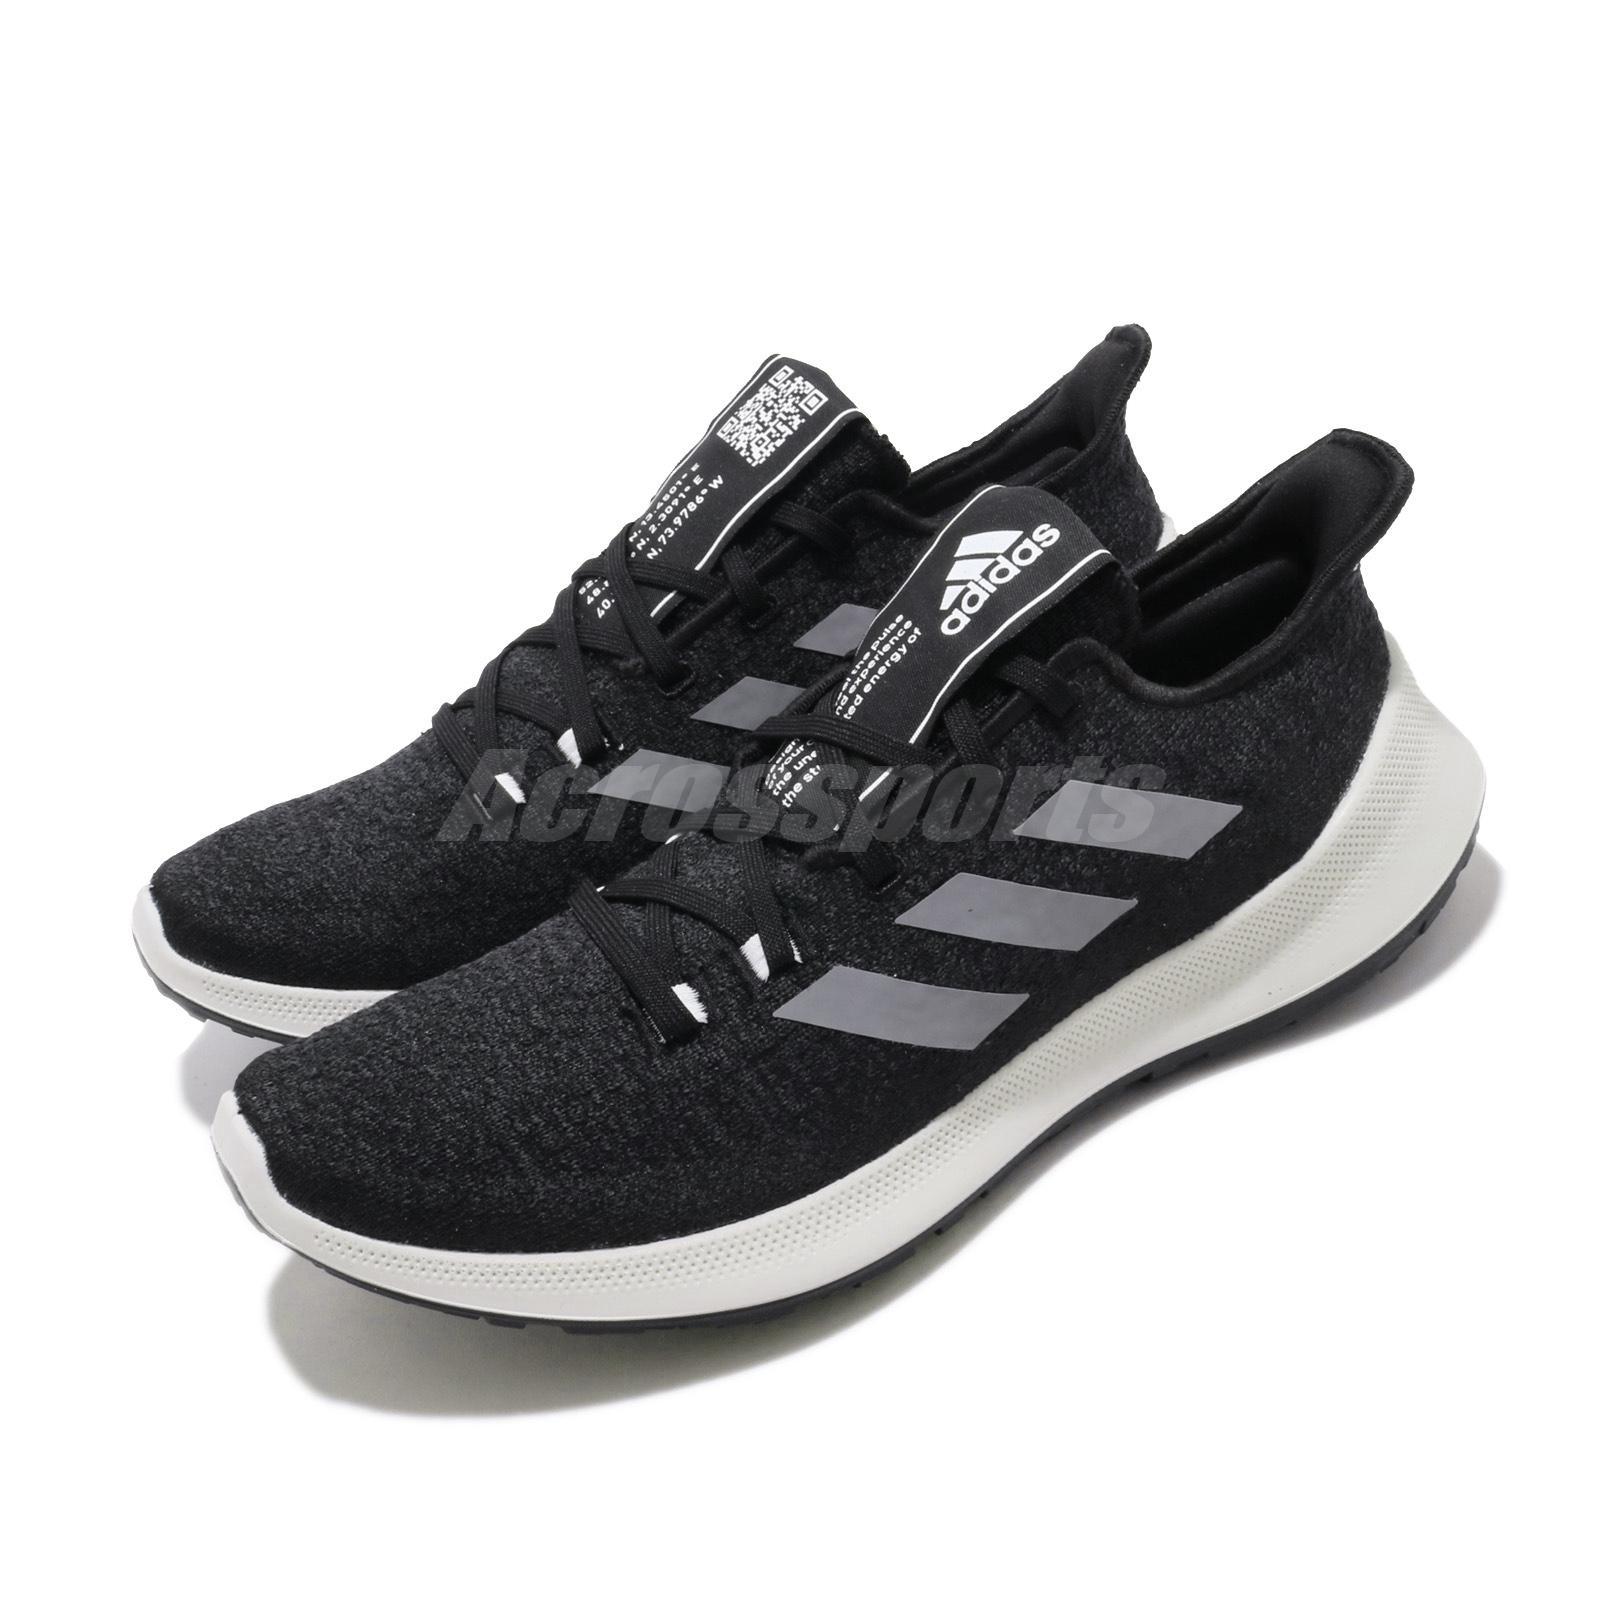 adidas SenseBOUNCE M Black Silver Mens